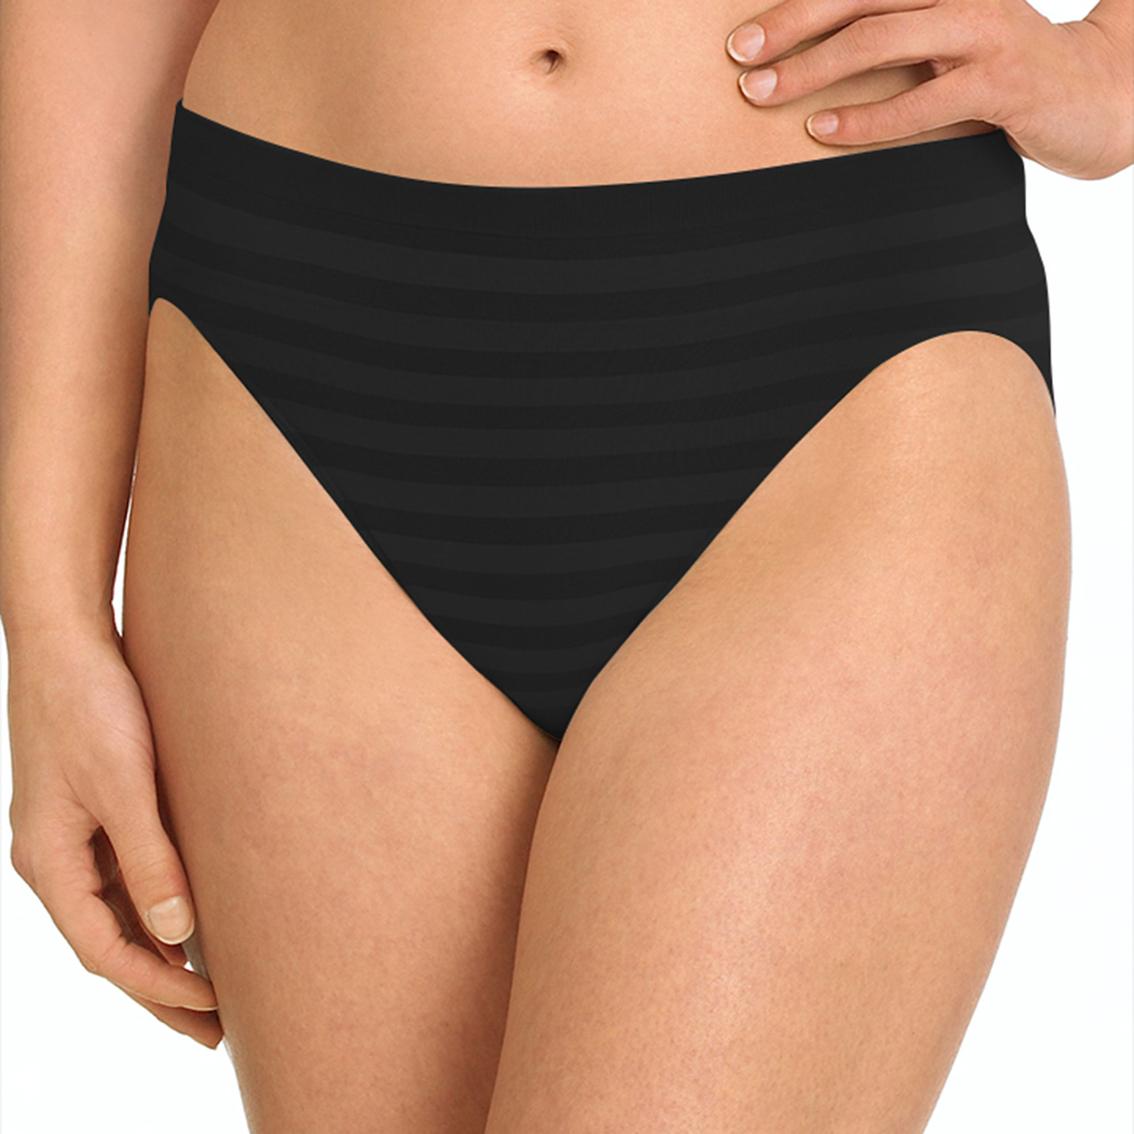 db968086bdd4 Jockey Matte-shine Hi Cut Underwear   Panties   Apparel   Shop The ...